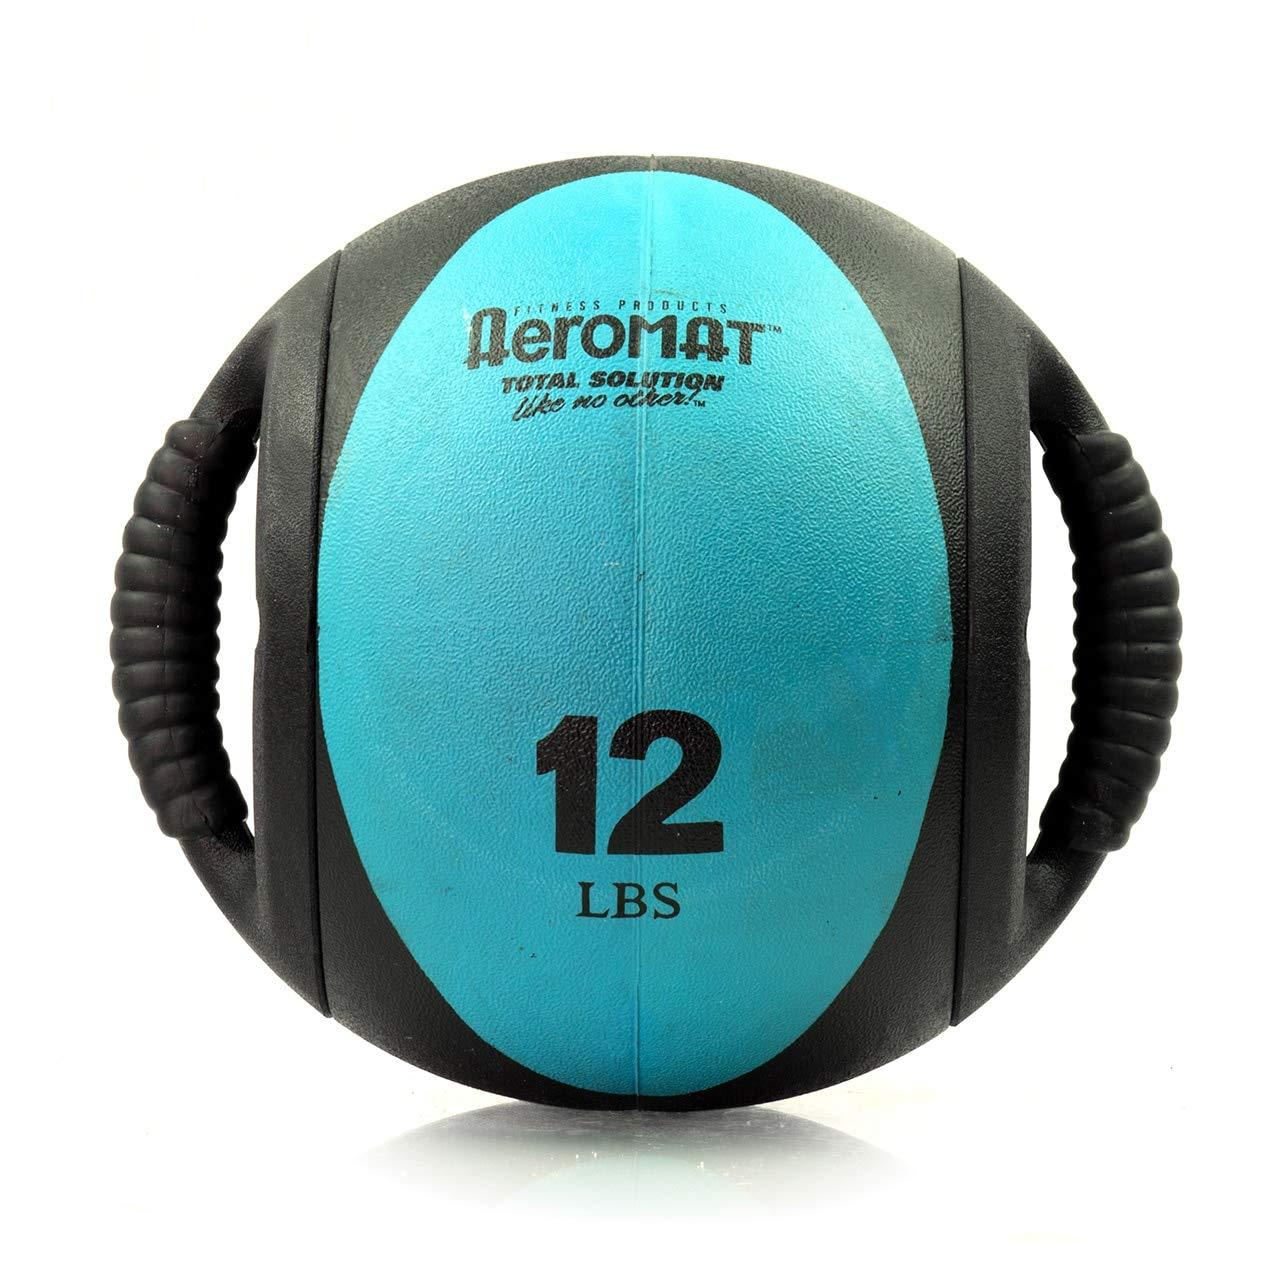 Aeromat Dual Grip Power Medicine Ball, 9cm/12-Pound, Black/Teal